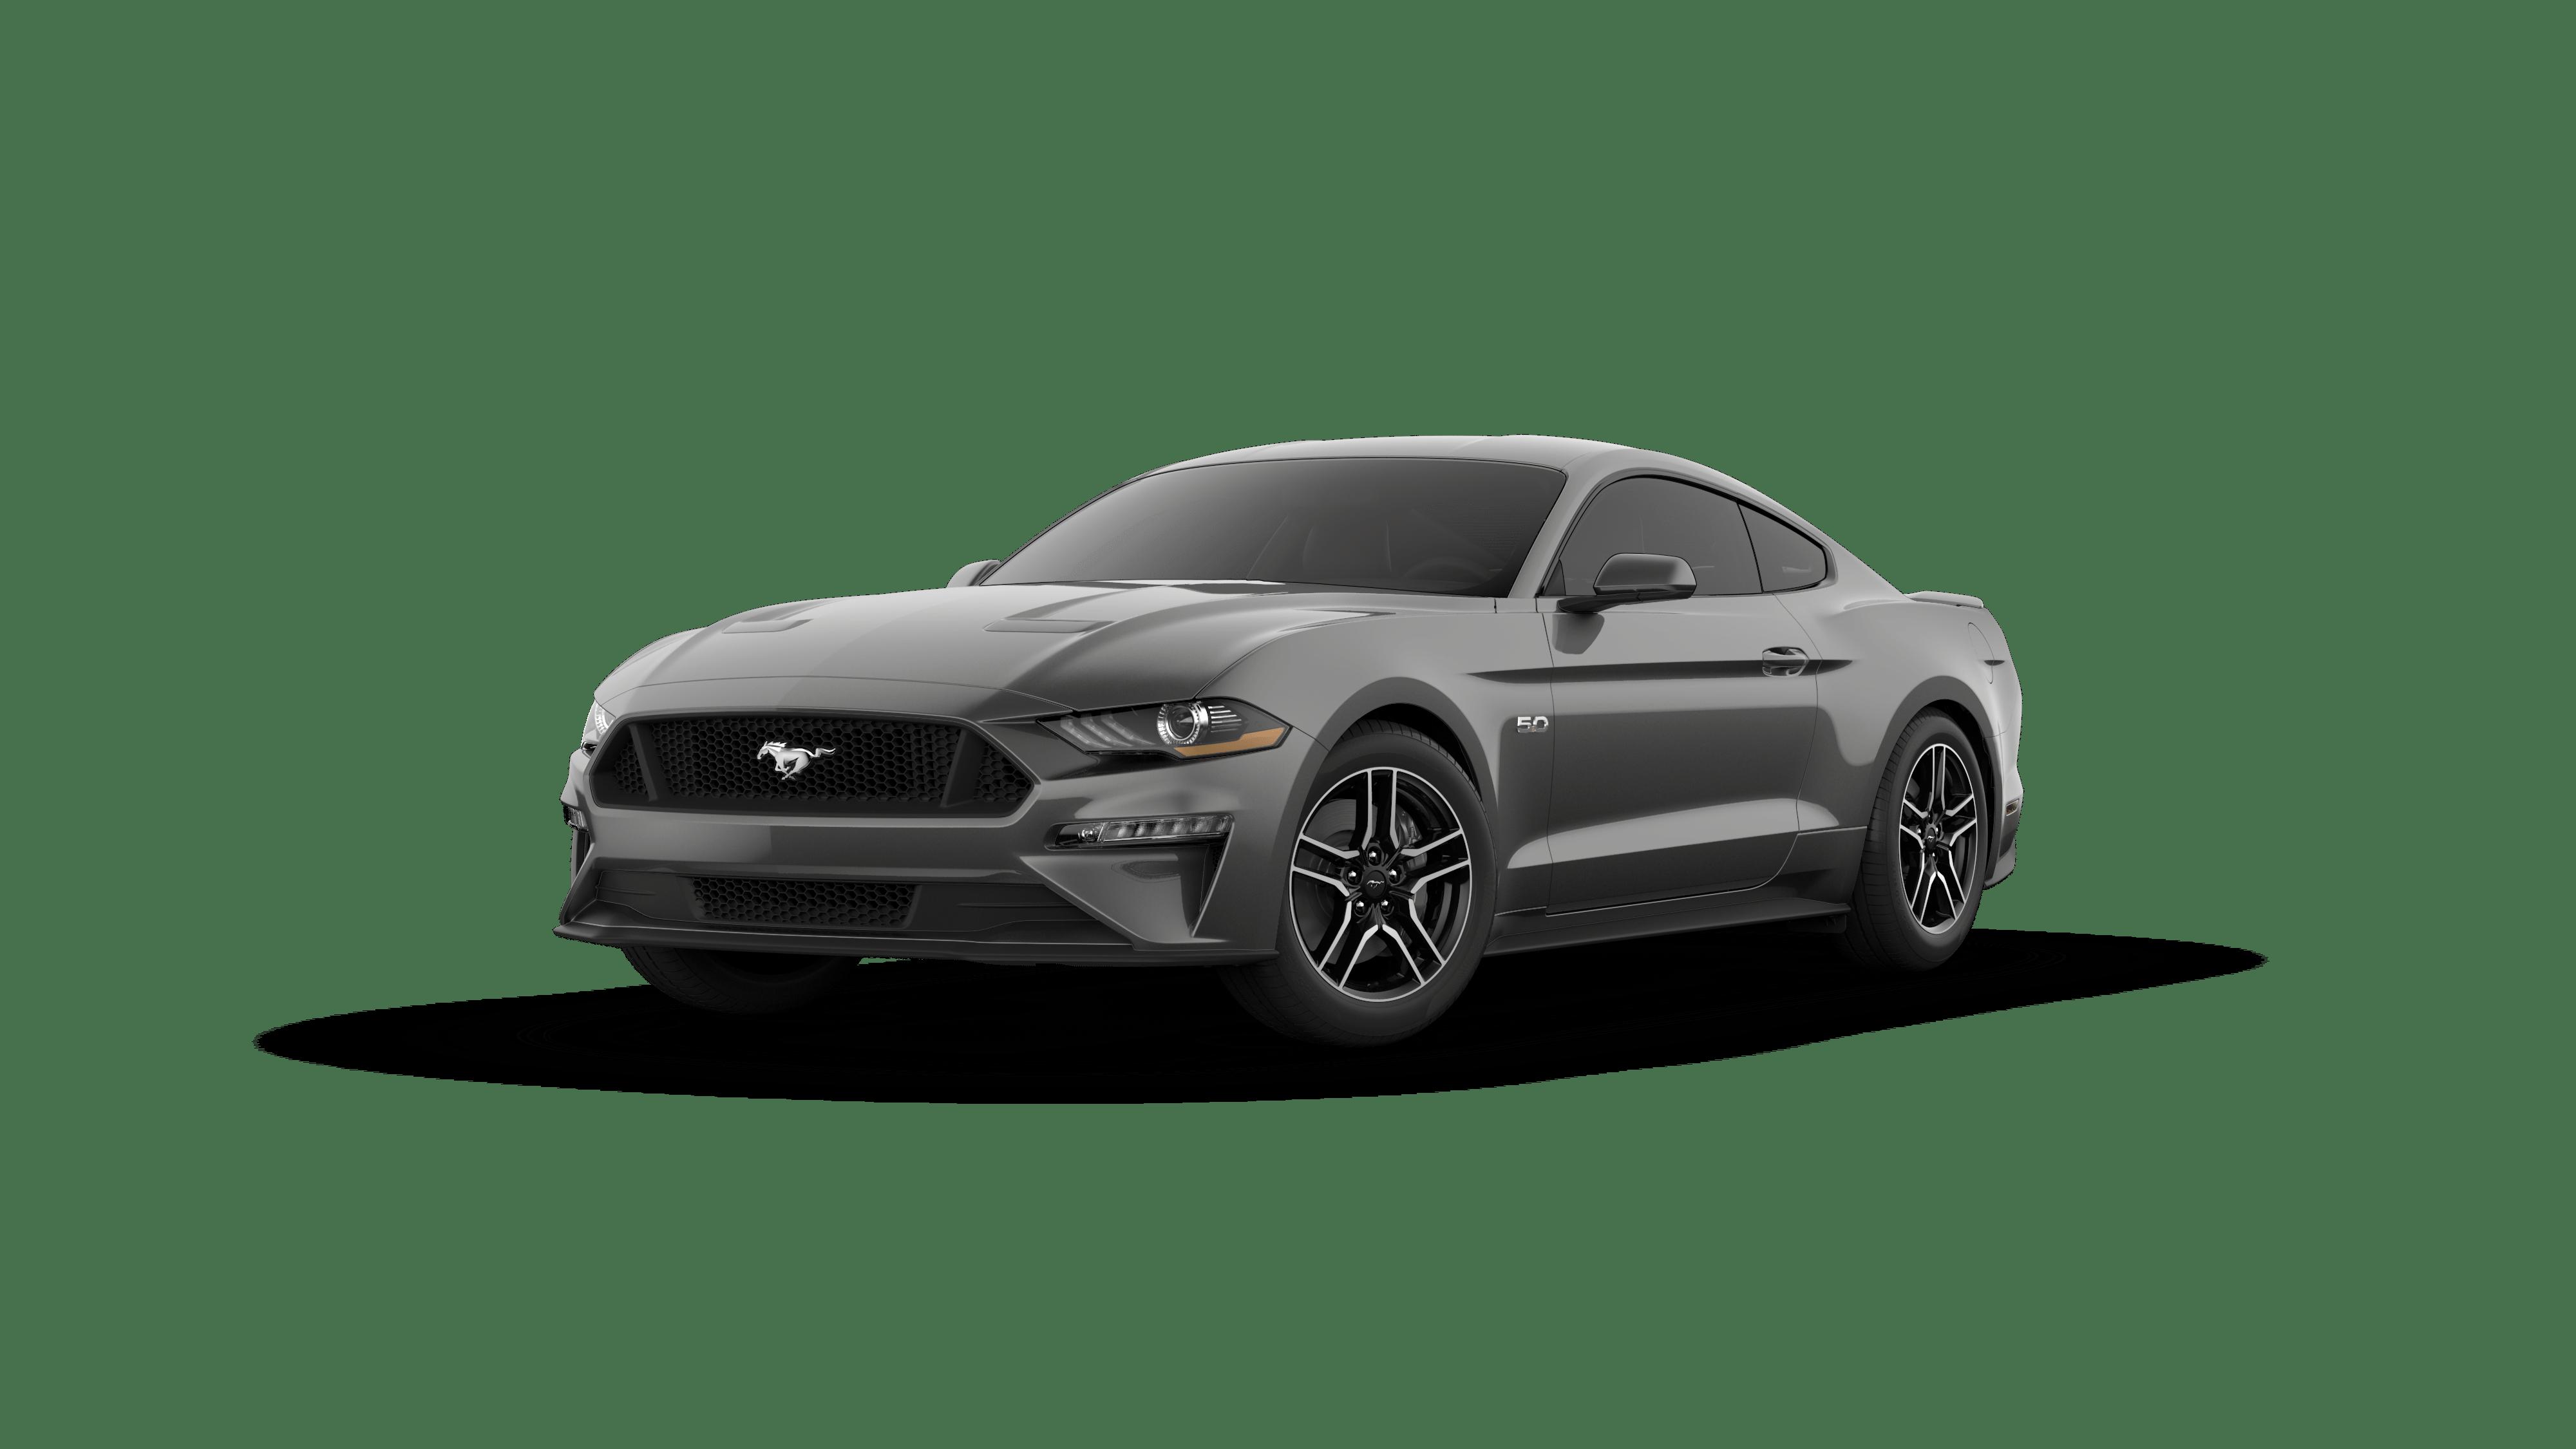 2018 Ford Mustang for sale in Lake Havasu City 1FA6P8CF0J